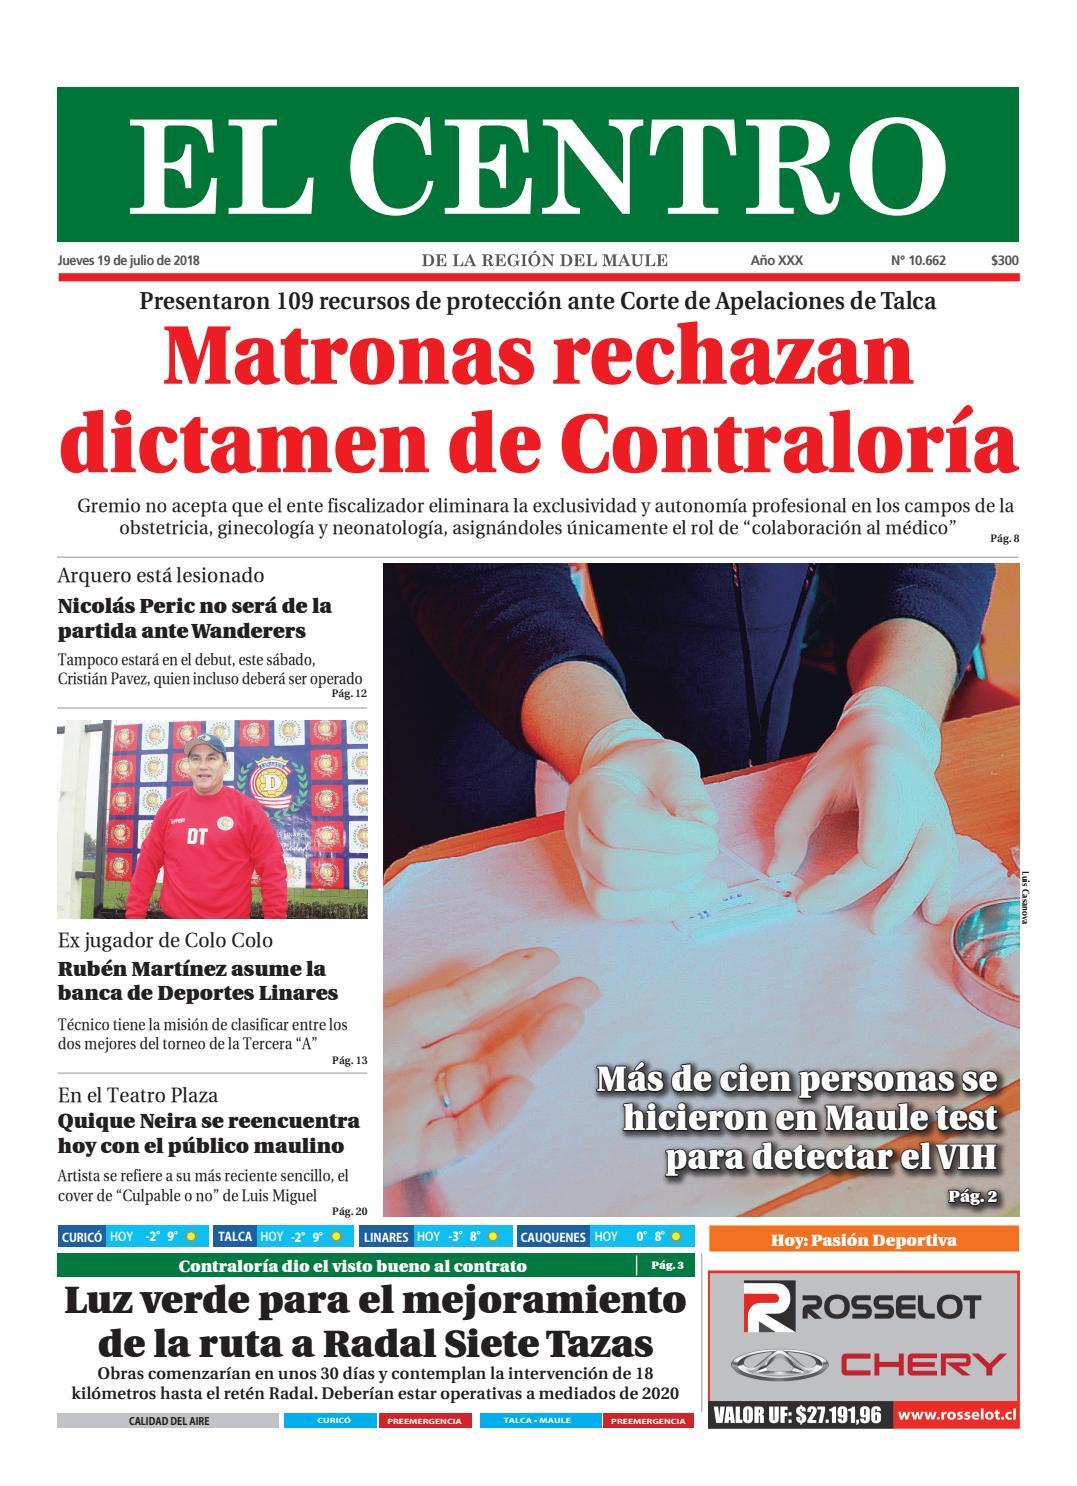 Camara Oculta Porno Ginecologia diario19-07-2018diario el centro s.a - issuu